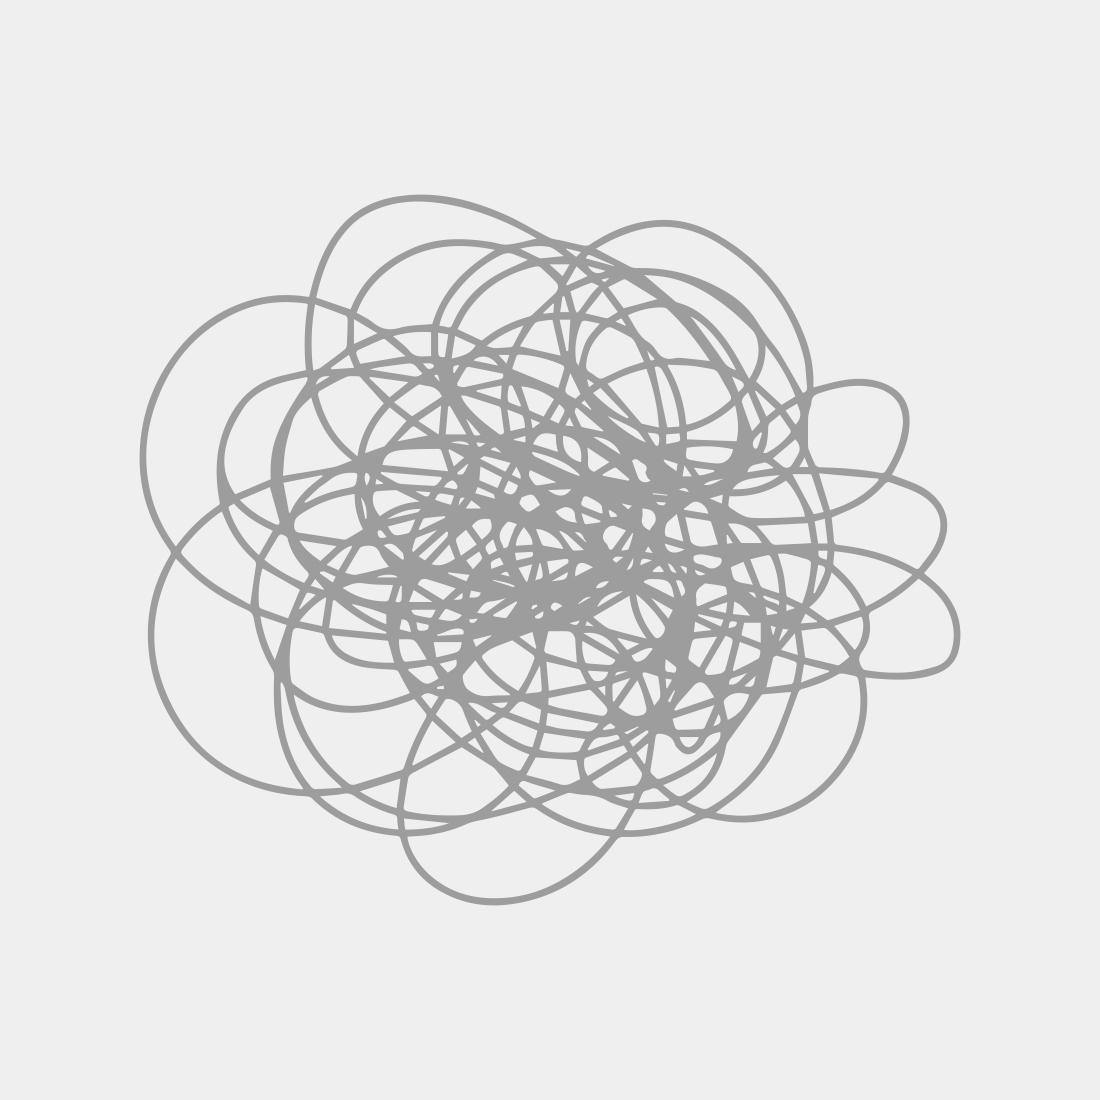 Emin / Munch Postcard Collection